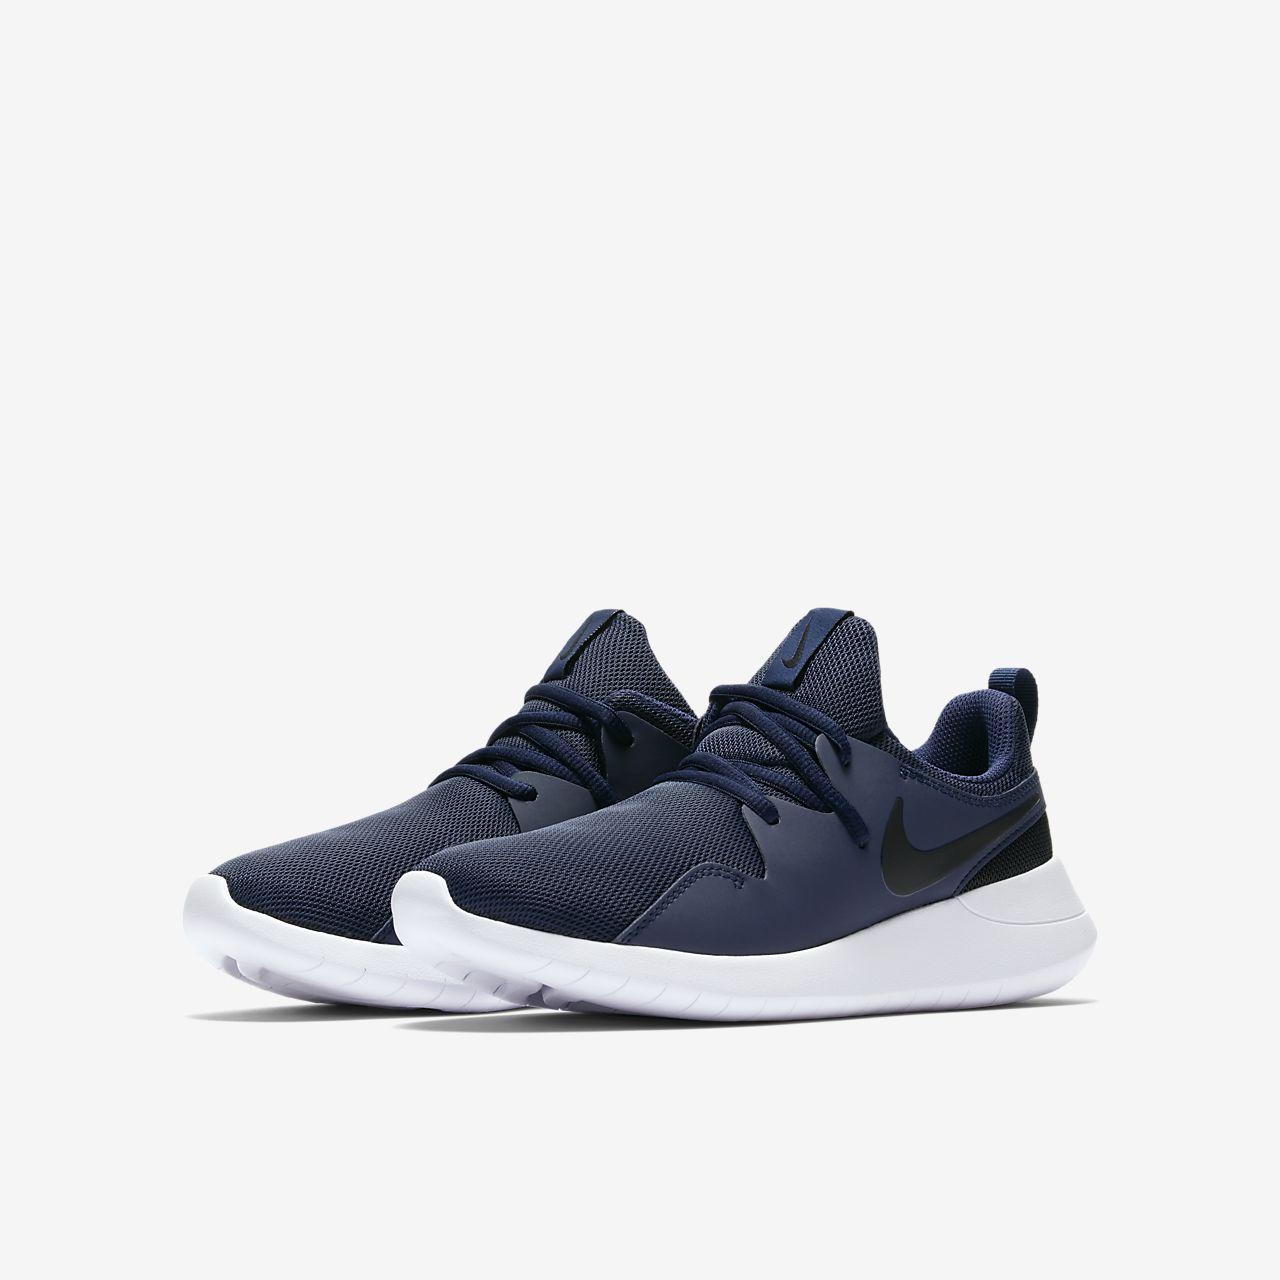 Nike TESSEN Scarpe Da Ginnastica Da Uomo Navy/Nero Scarpe Sportive Scarpe Da Ginnastica